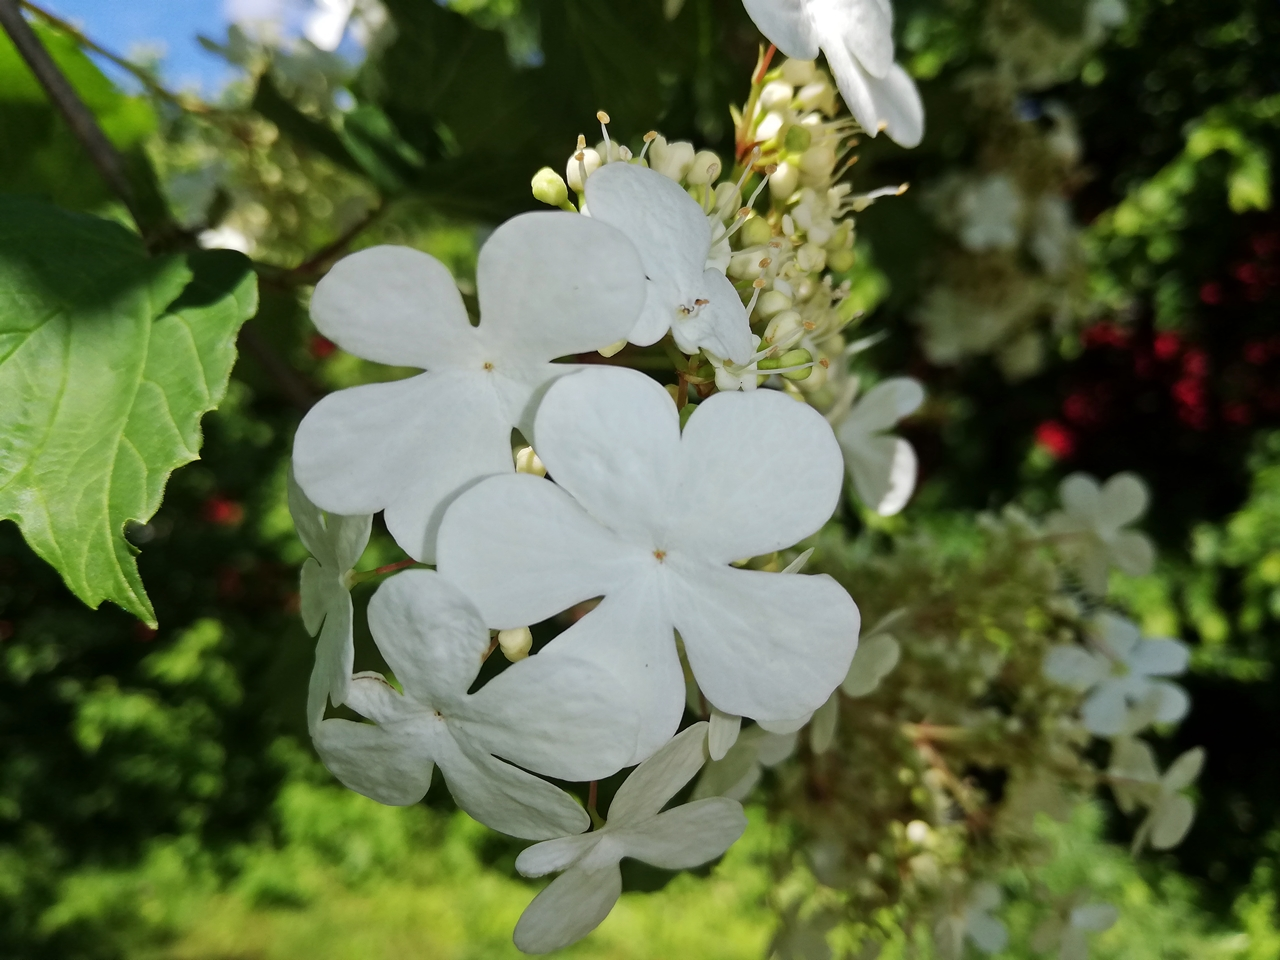 Schneeball - Snwoball/guelder rose, viburnum opulus